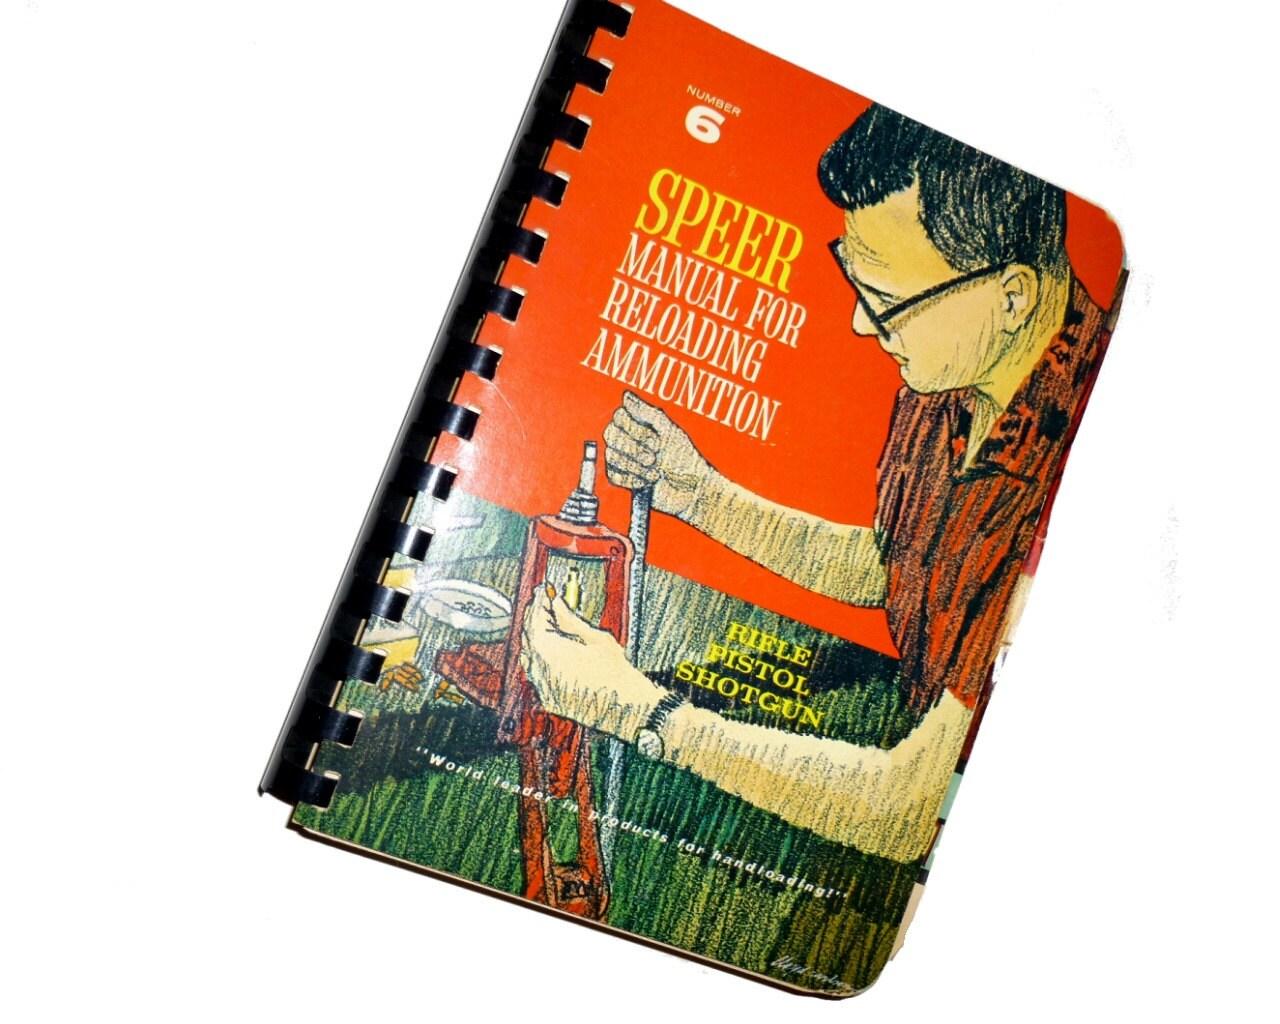 Speer Reloading Manual #15 - Item# 1499622 | Sportsman's ...